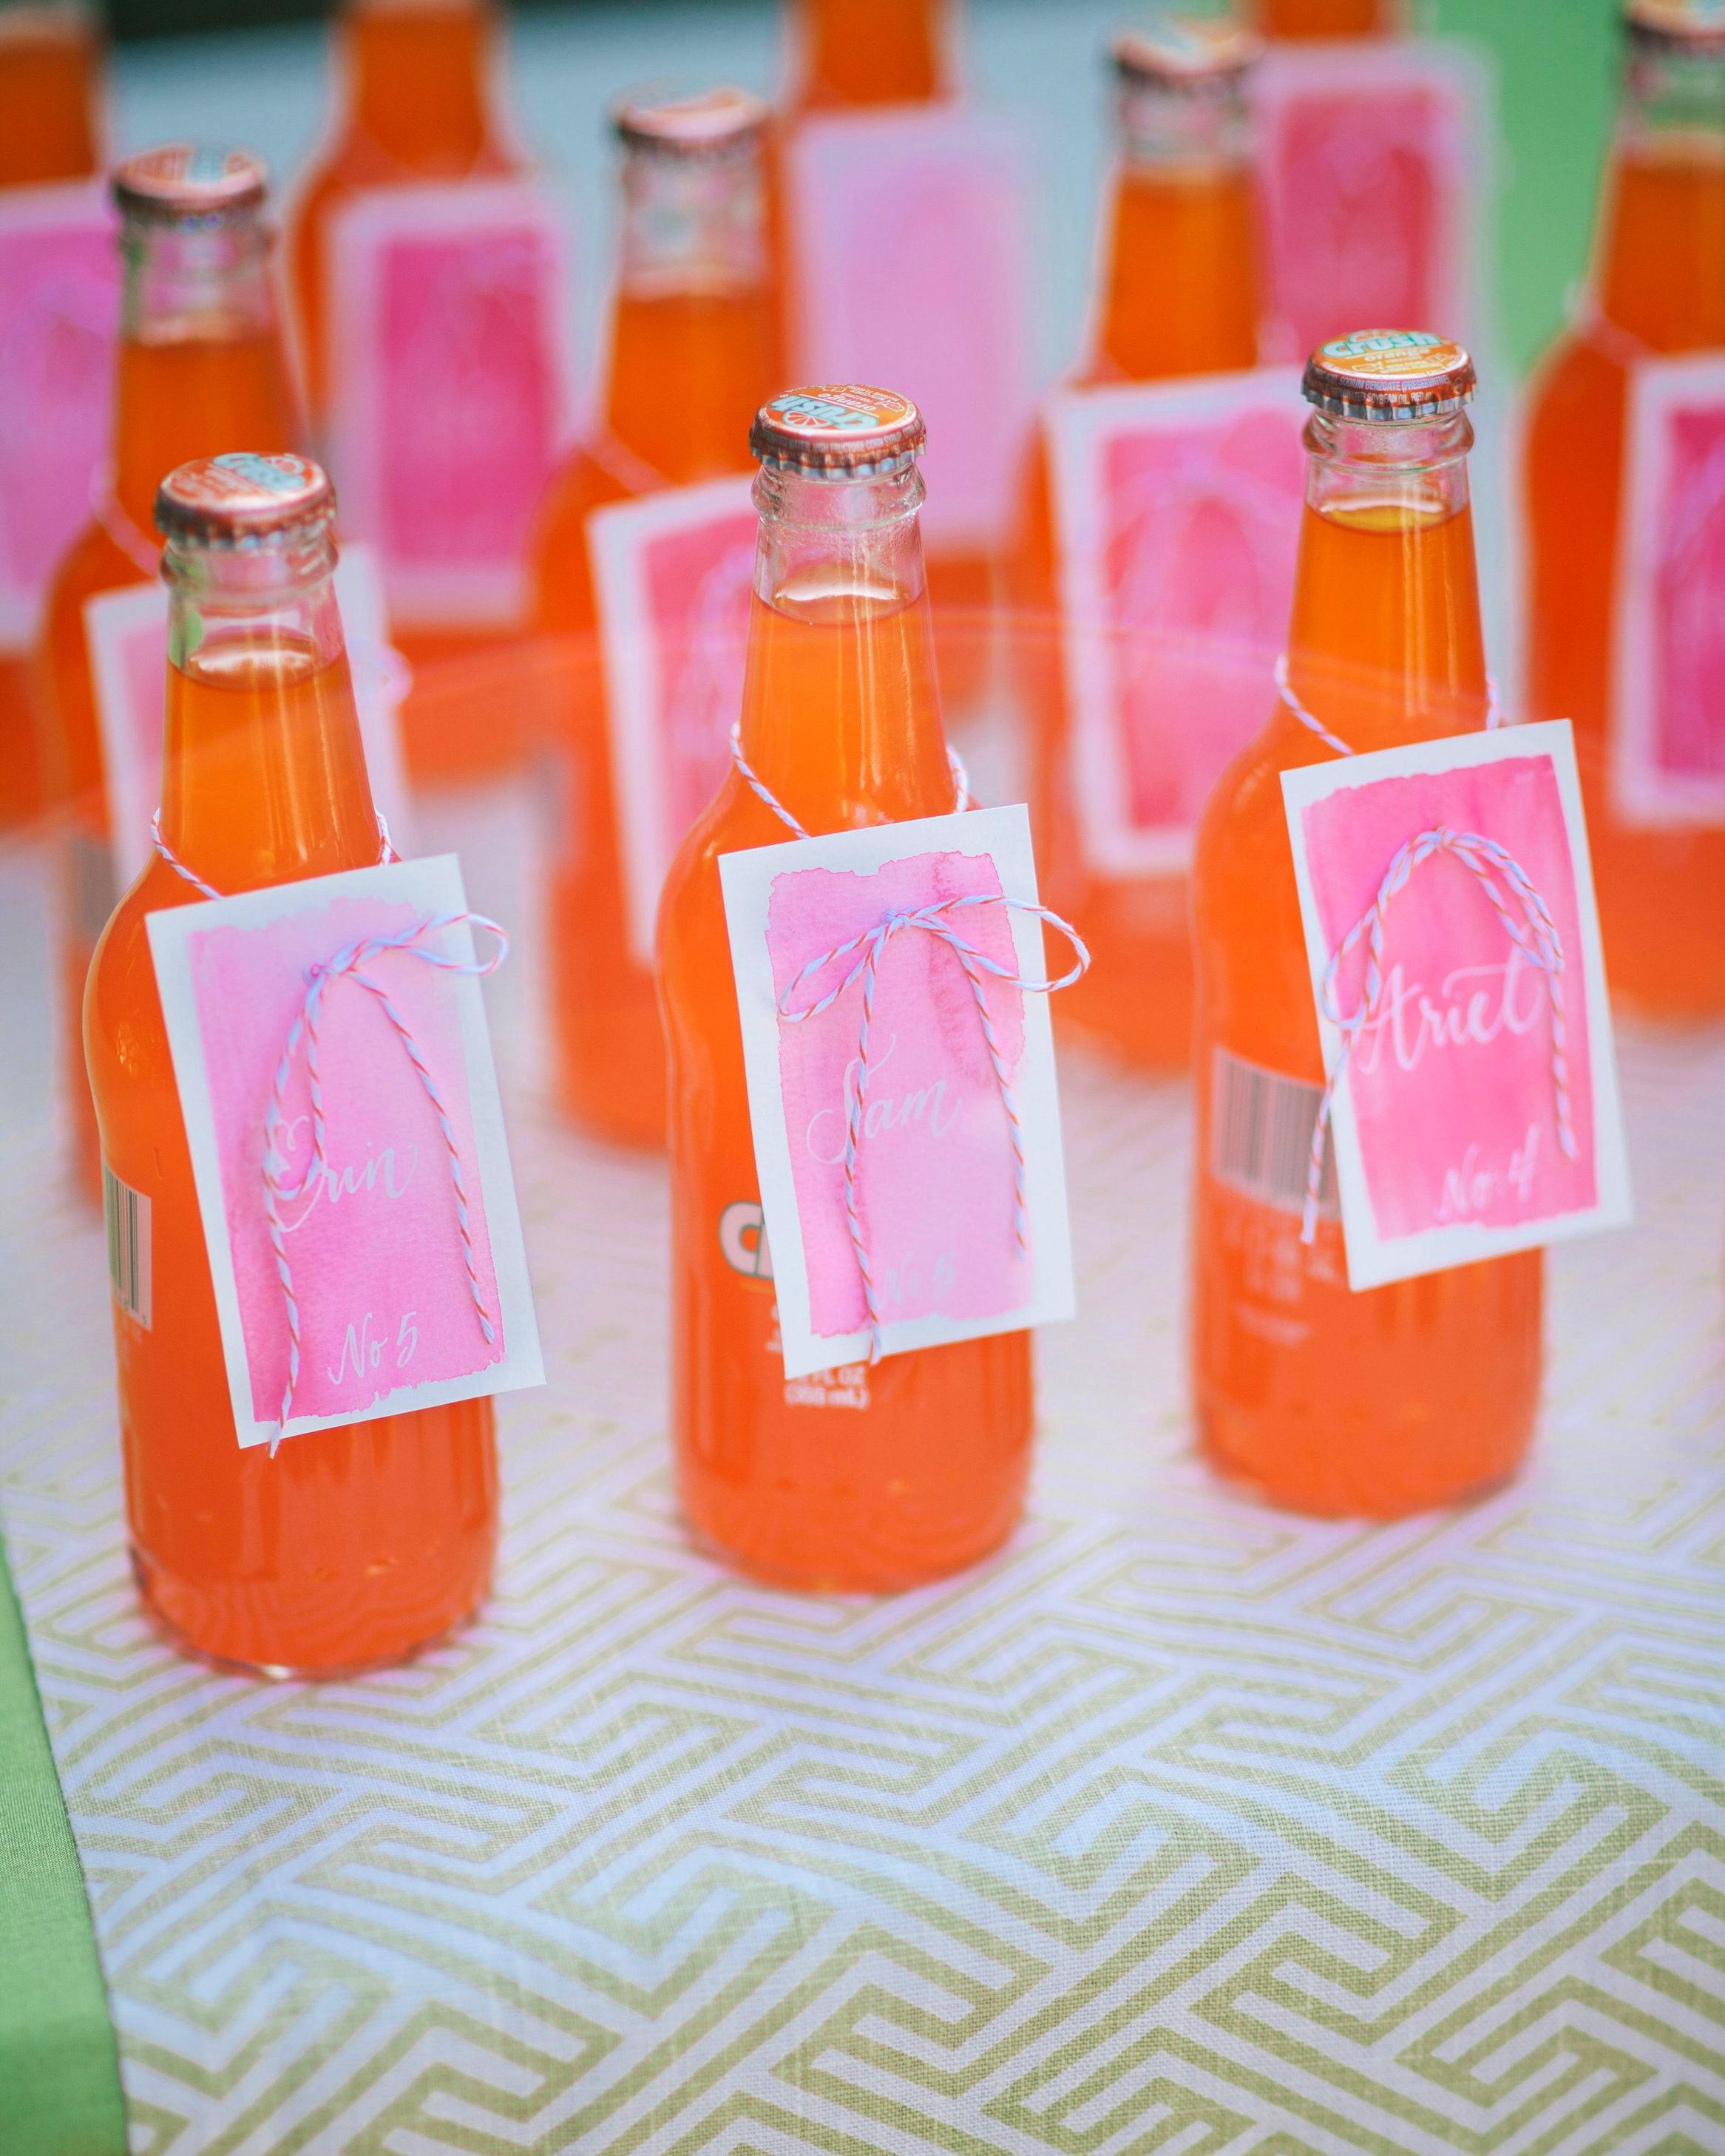 hydration stations non alcoholic orange soda with nametag